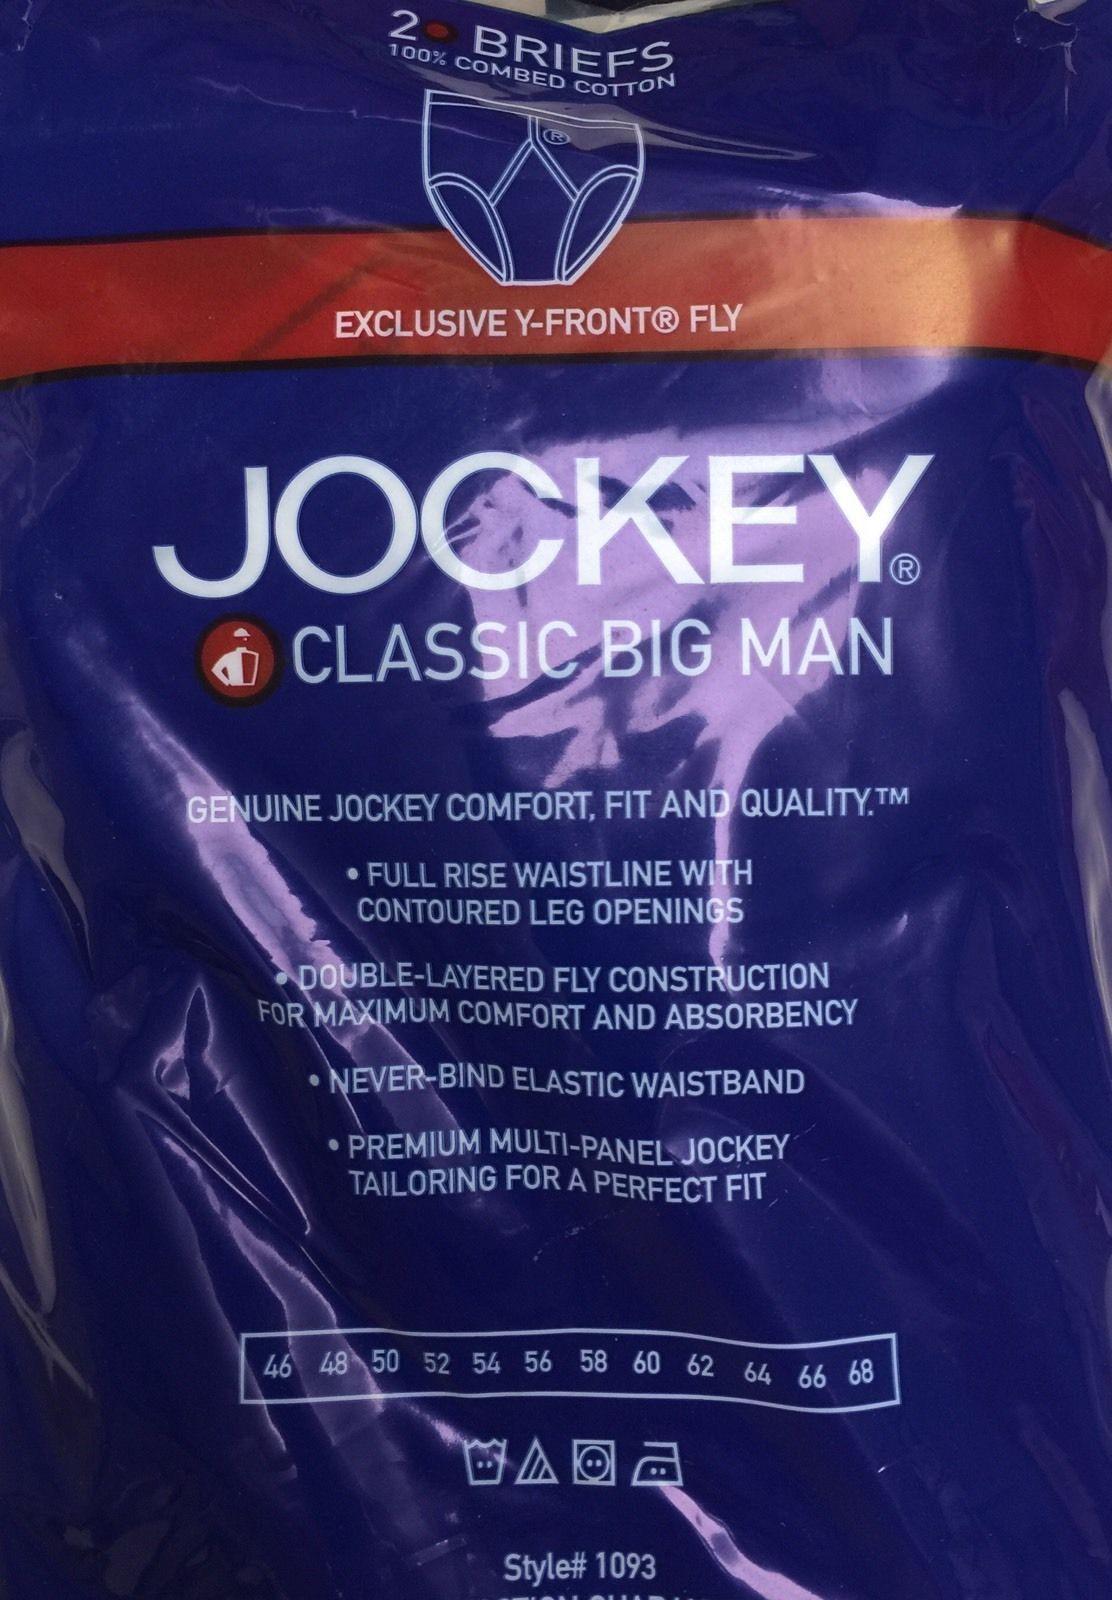 68 Jockey Big Man Classic Brief 52 58 56 50 64 54 60 Sizes 46,48